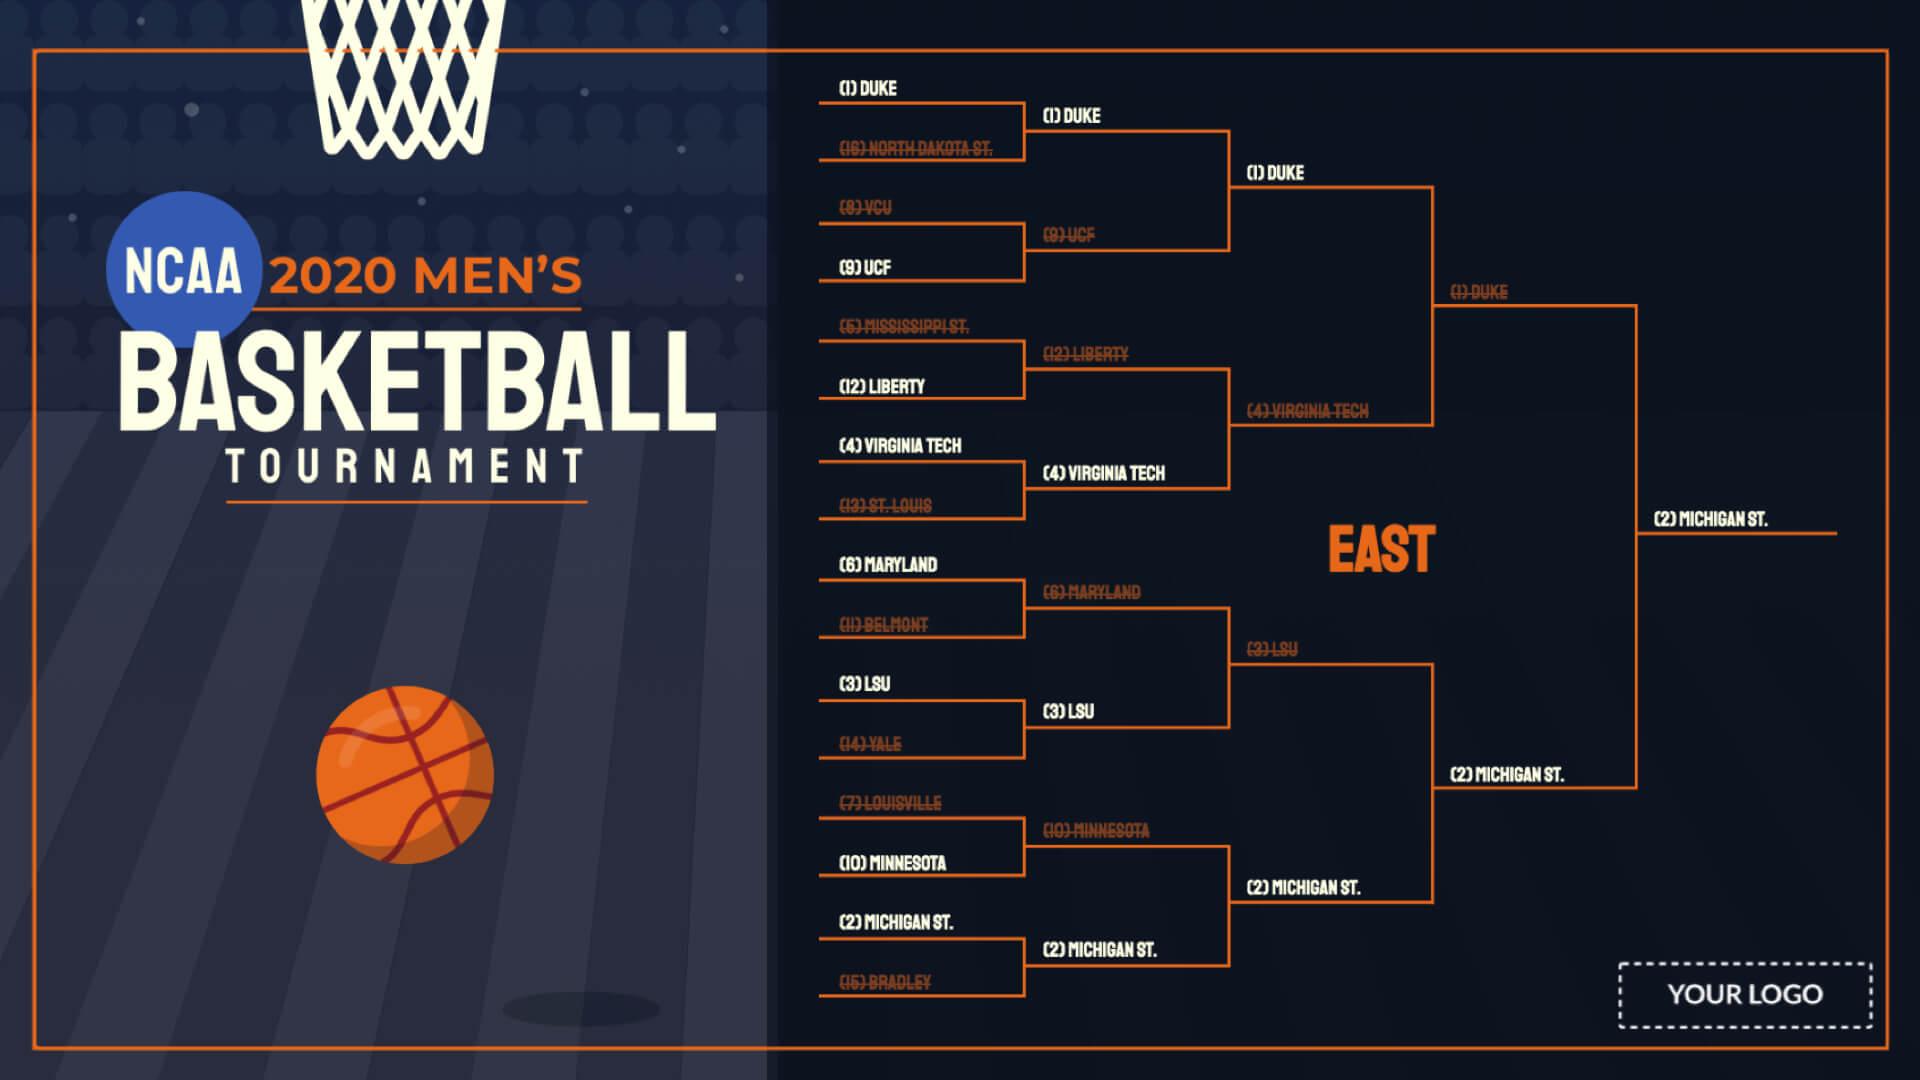 2020 NCAA Men's Tournament Digital Signage Template